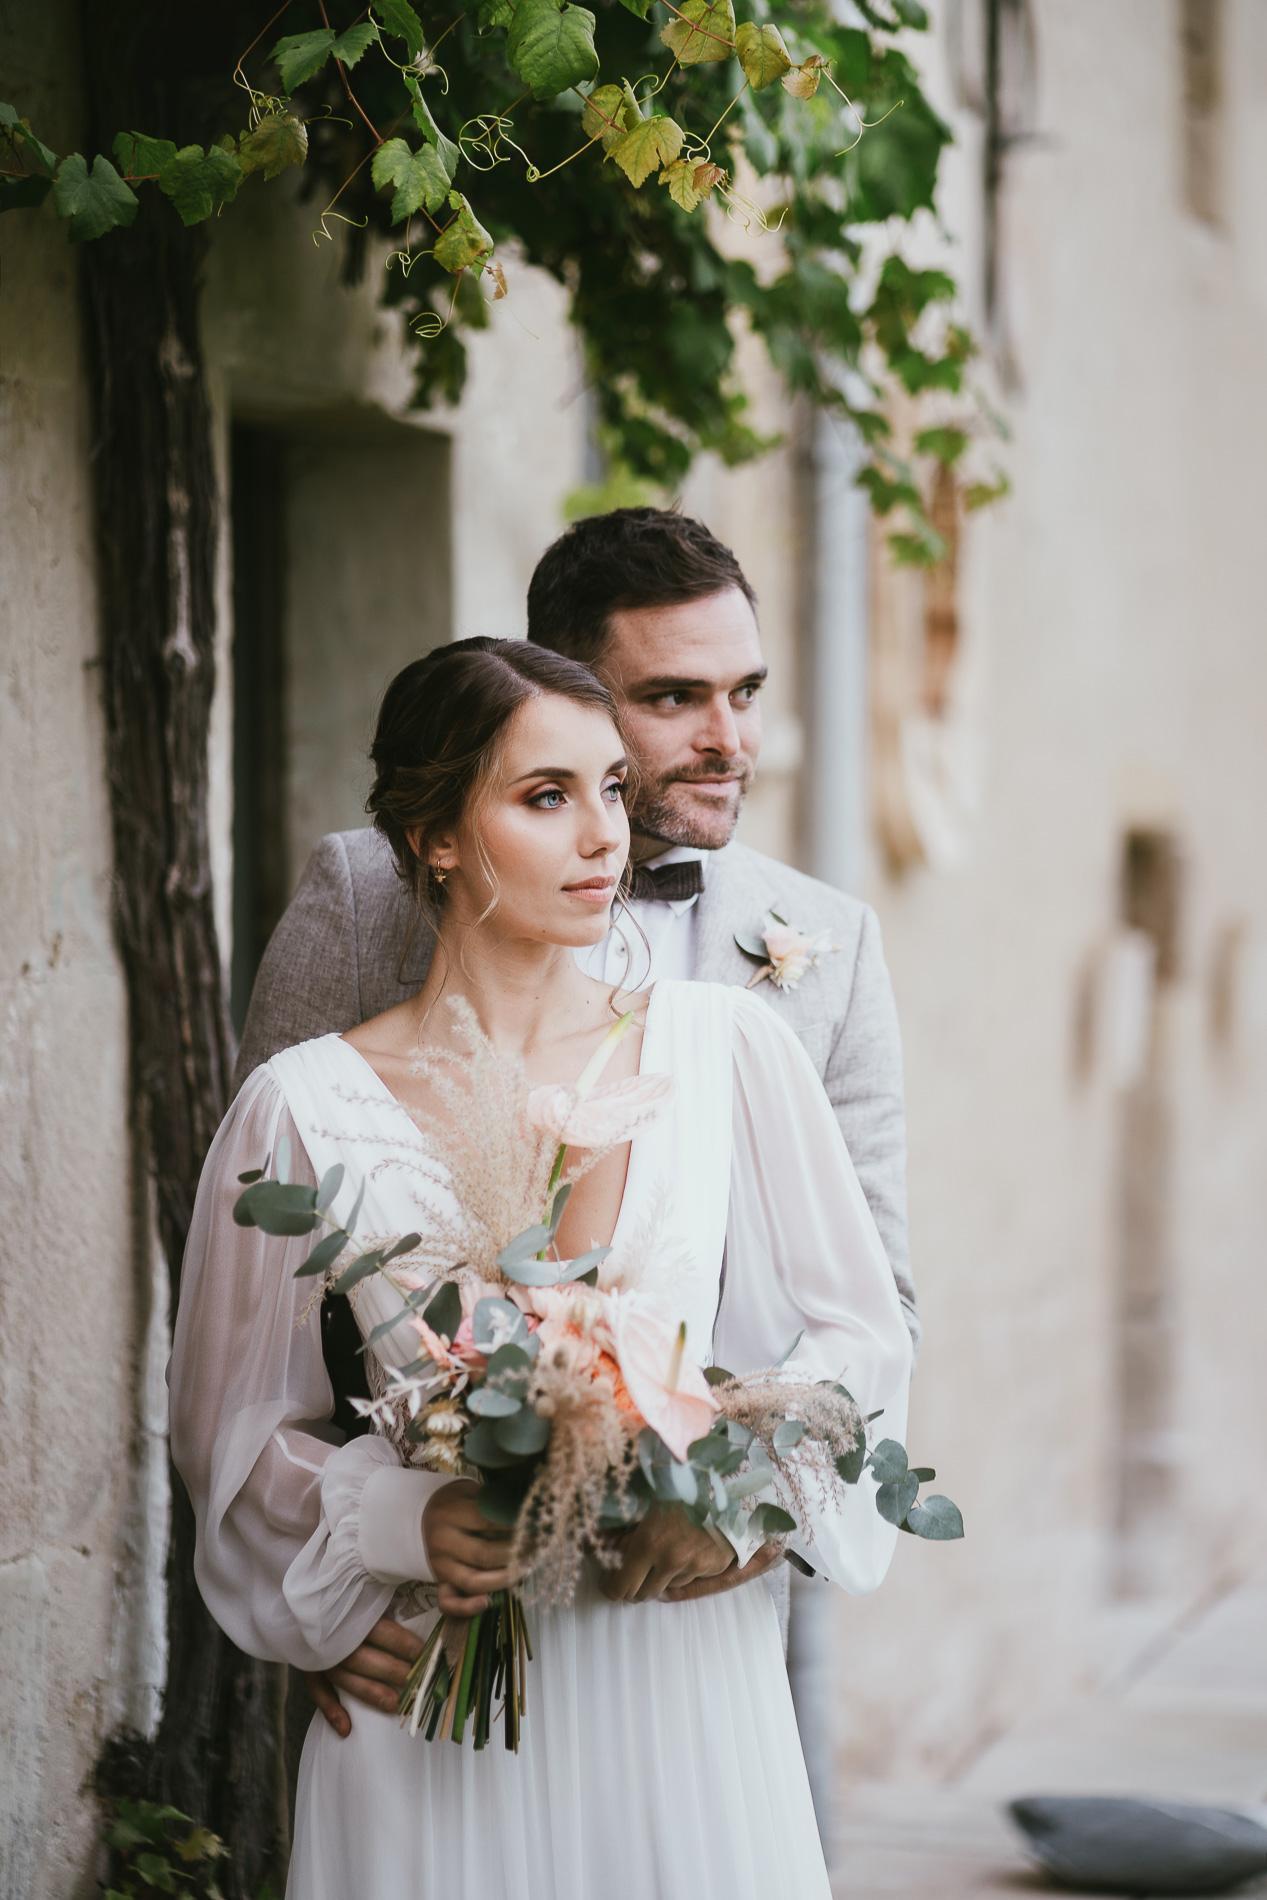 Photographe mariage landes dax aquitaine boheme moody chic 18